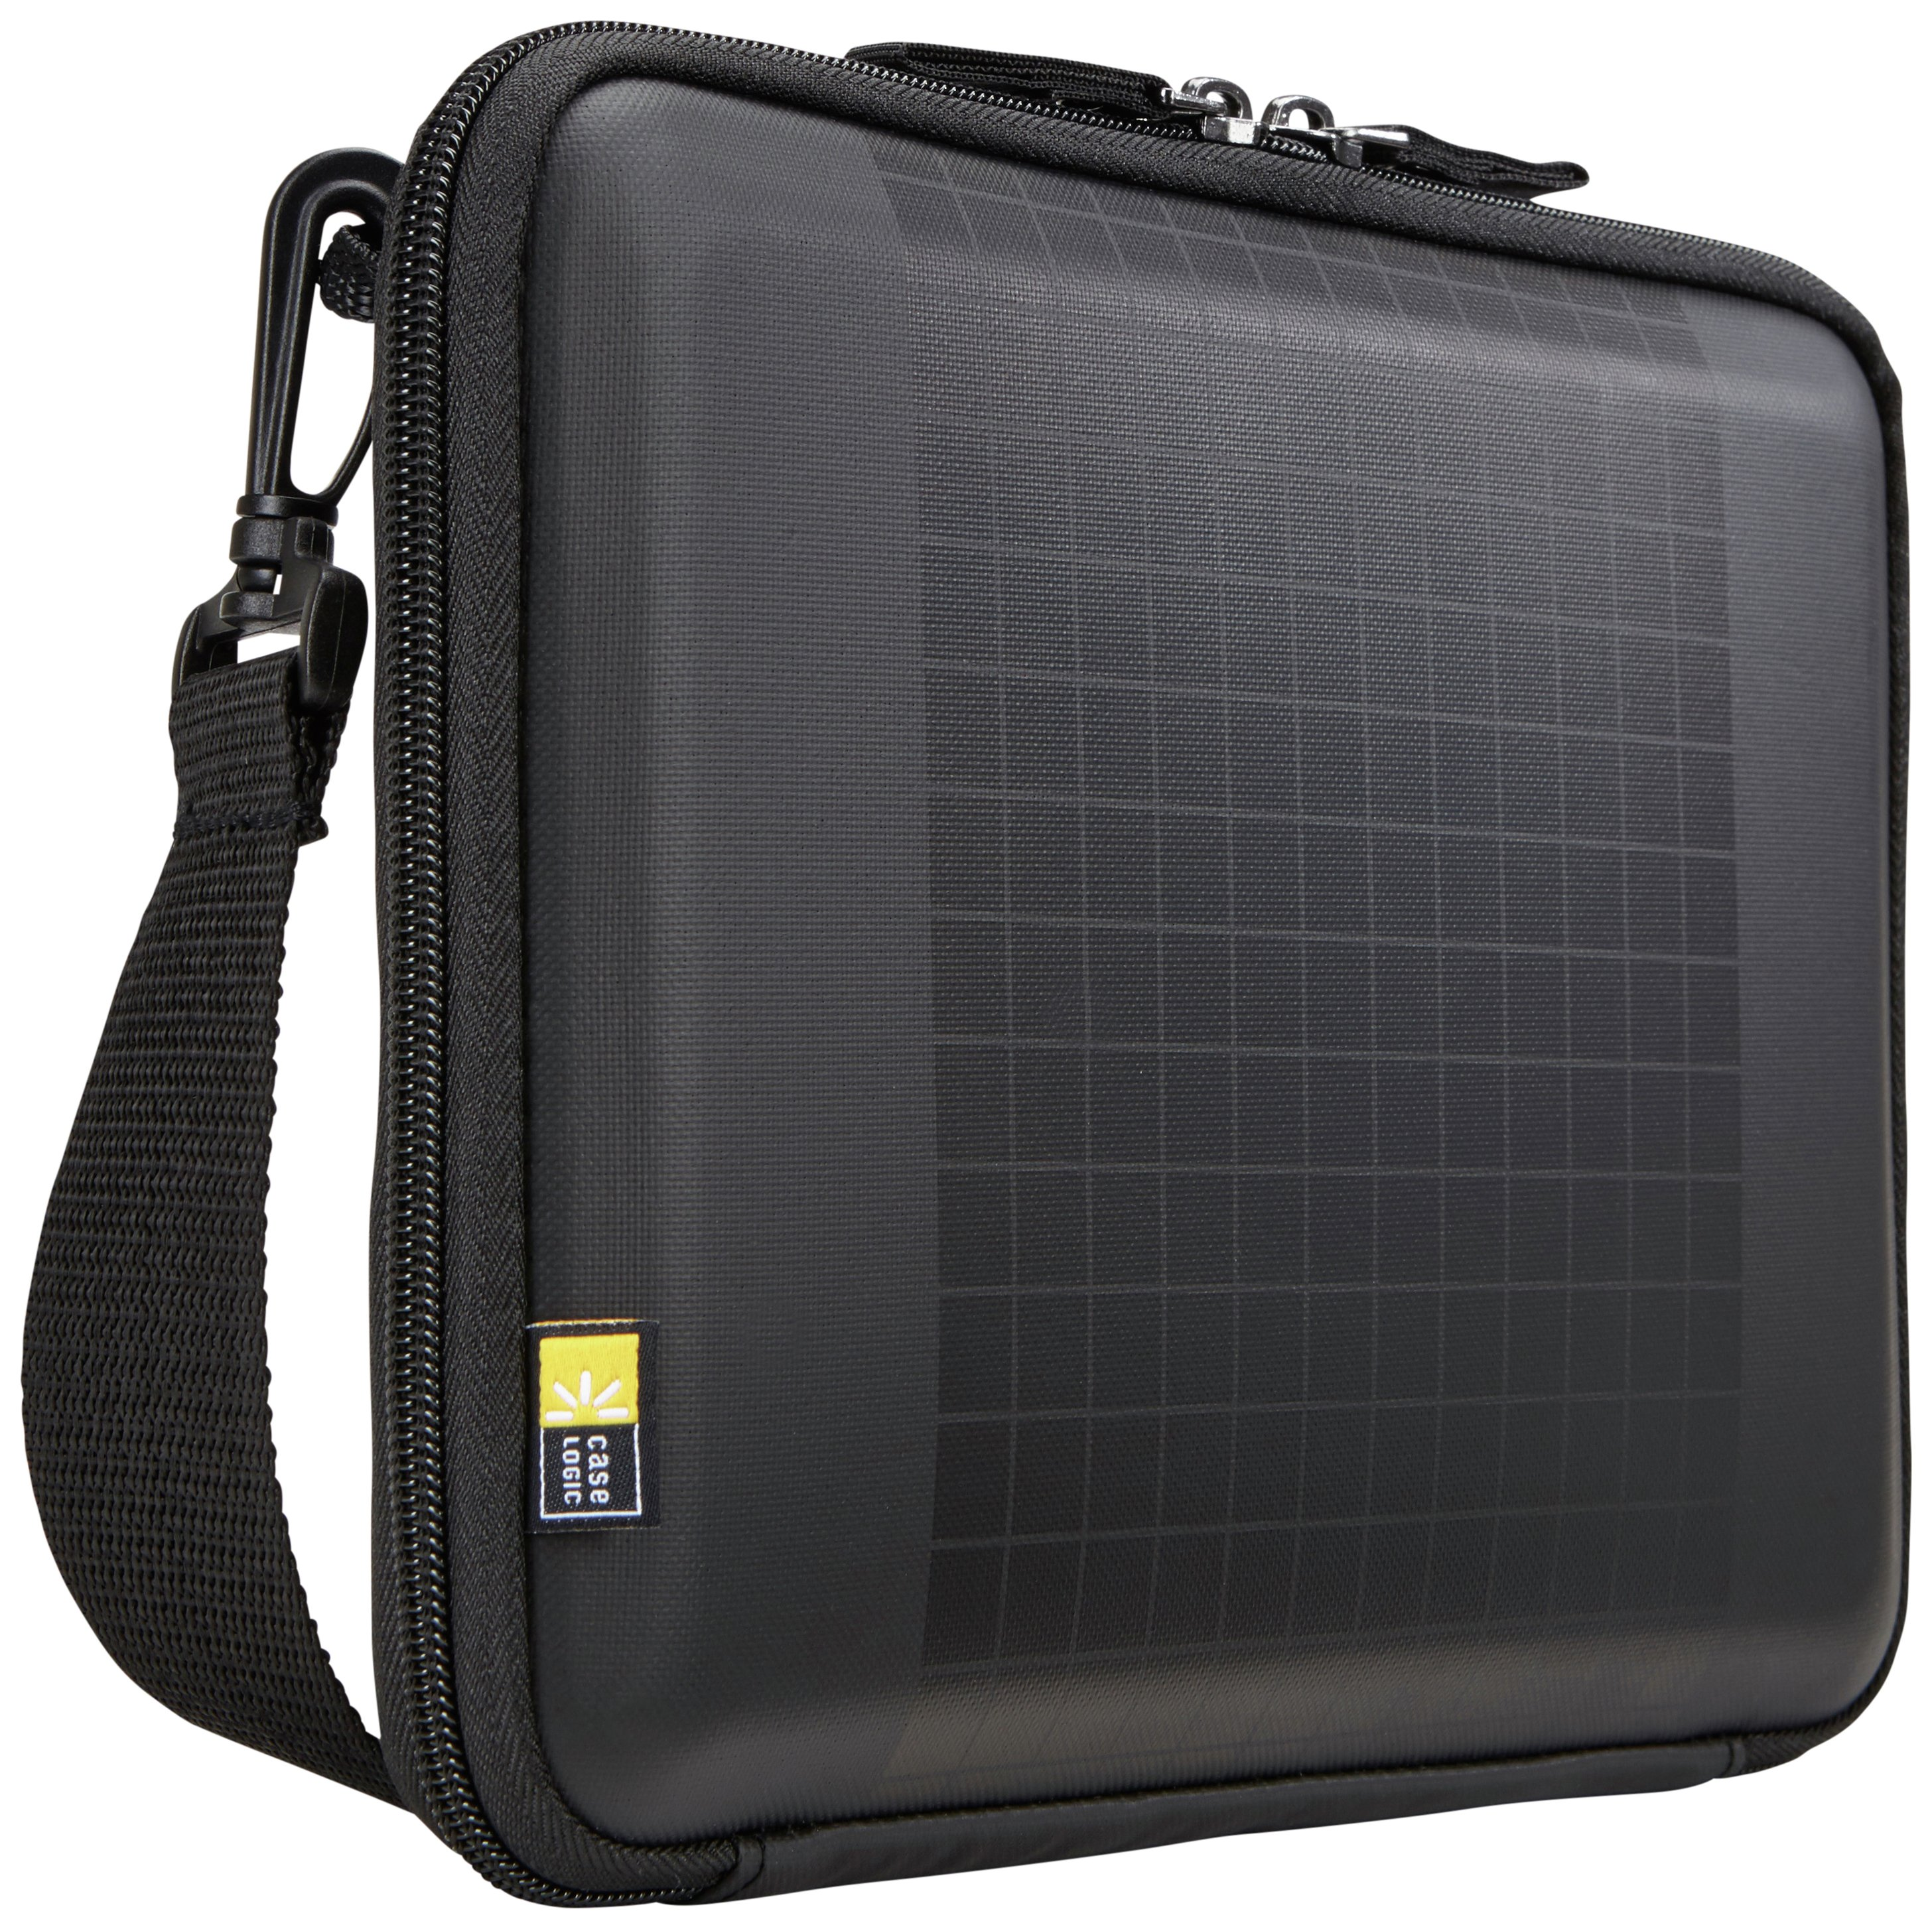 Image of Case Logic - ARCA 10 inch Carrying Case - Black